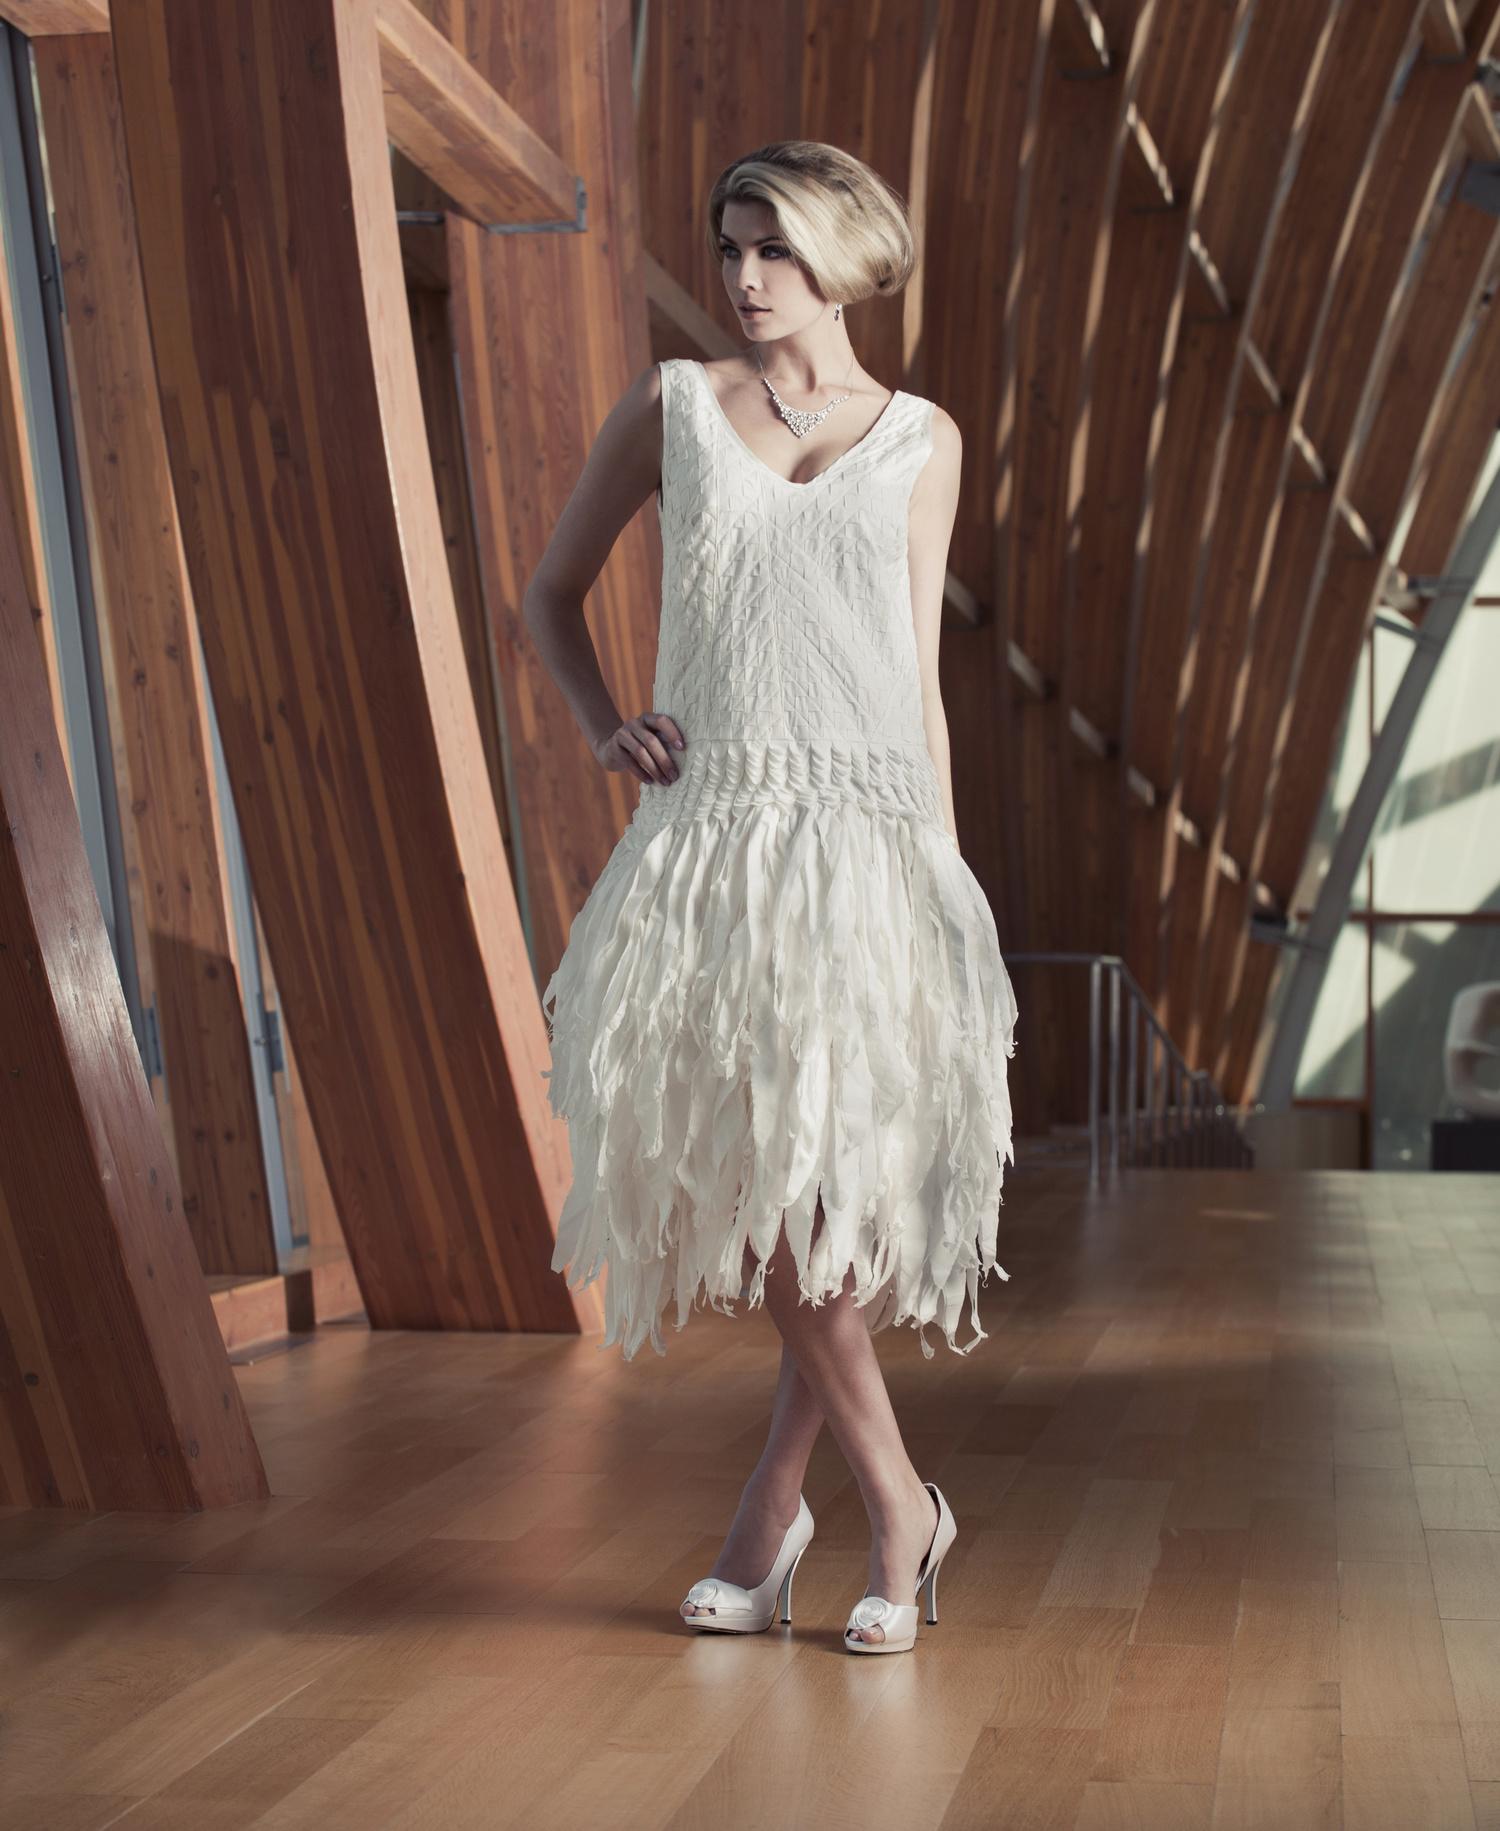 White-Cashmere-Collection-2013-Comrags-Photographer-Caitlin-Cronenberg.jpg